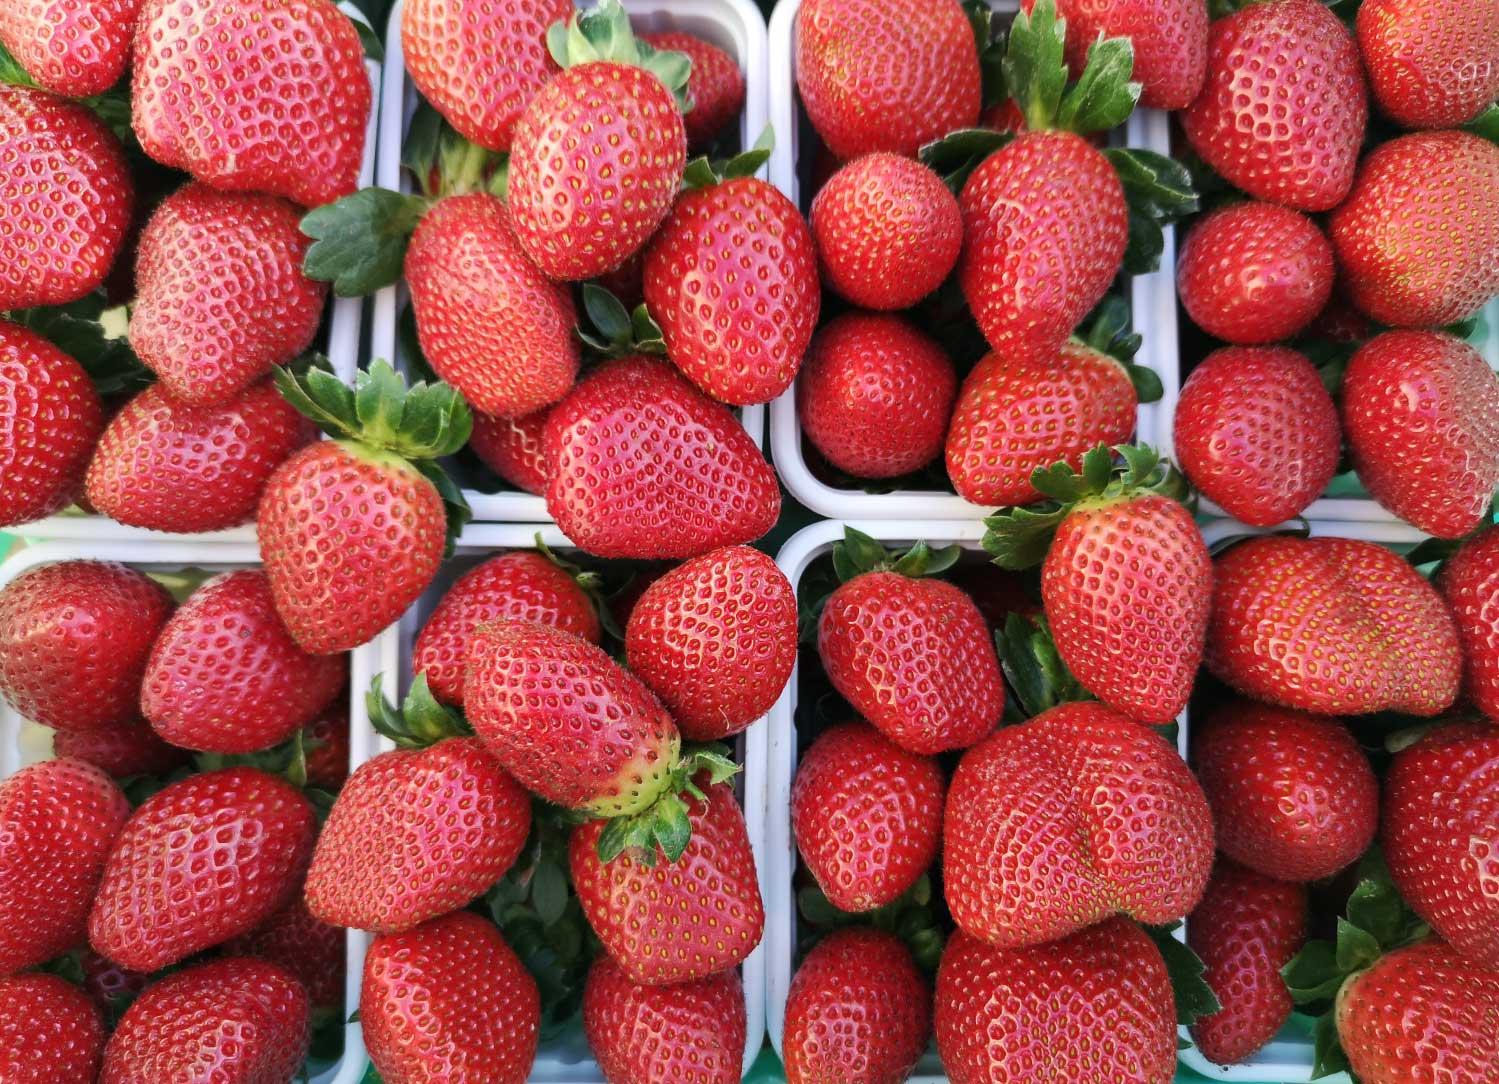 strawberries-fresh-malta-7-health-benefits